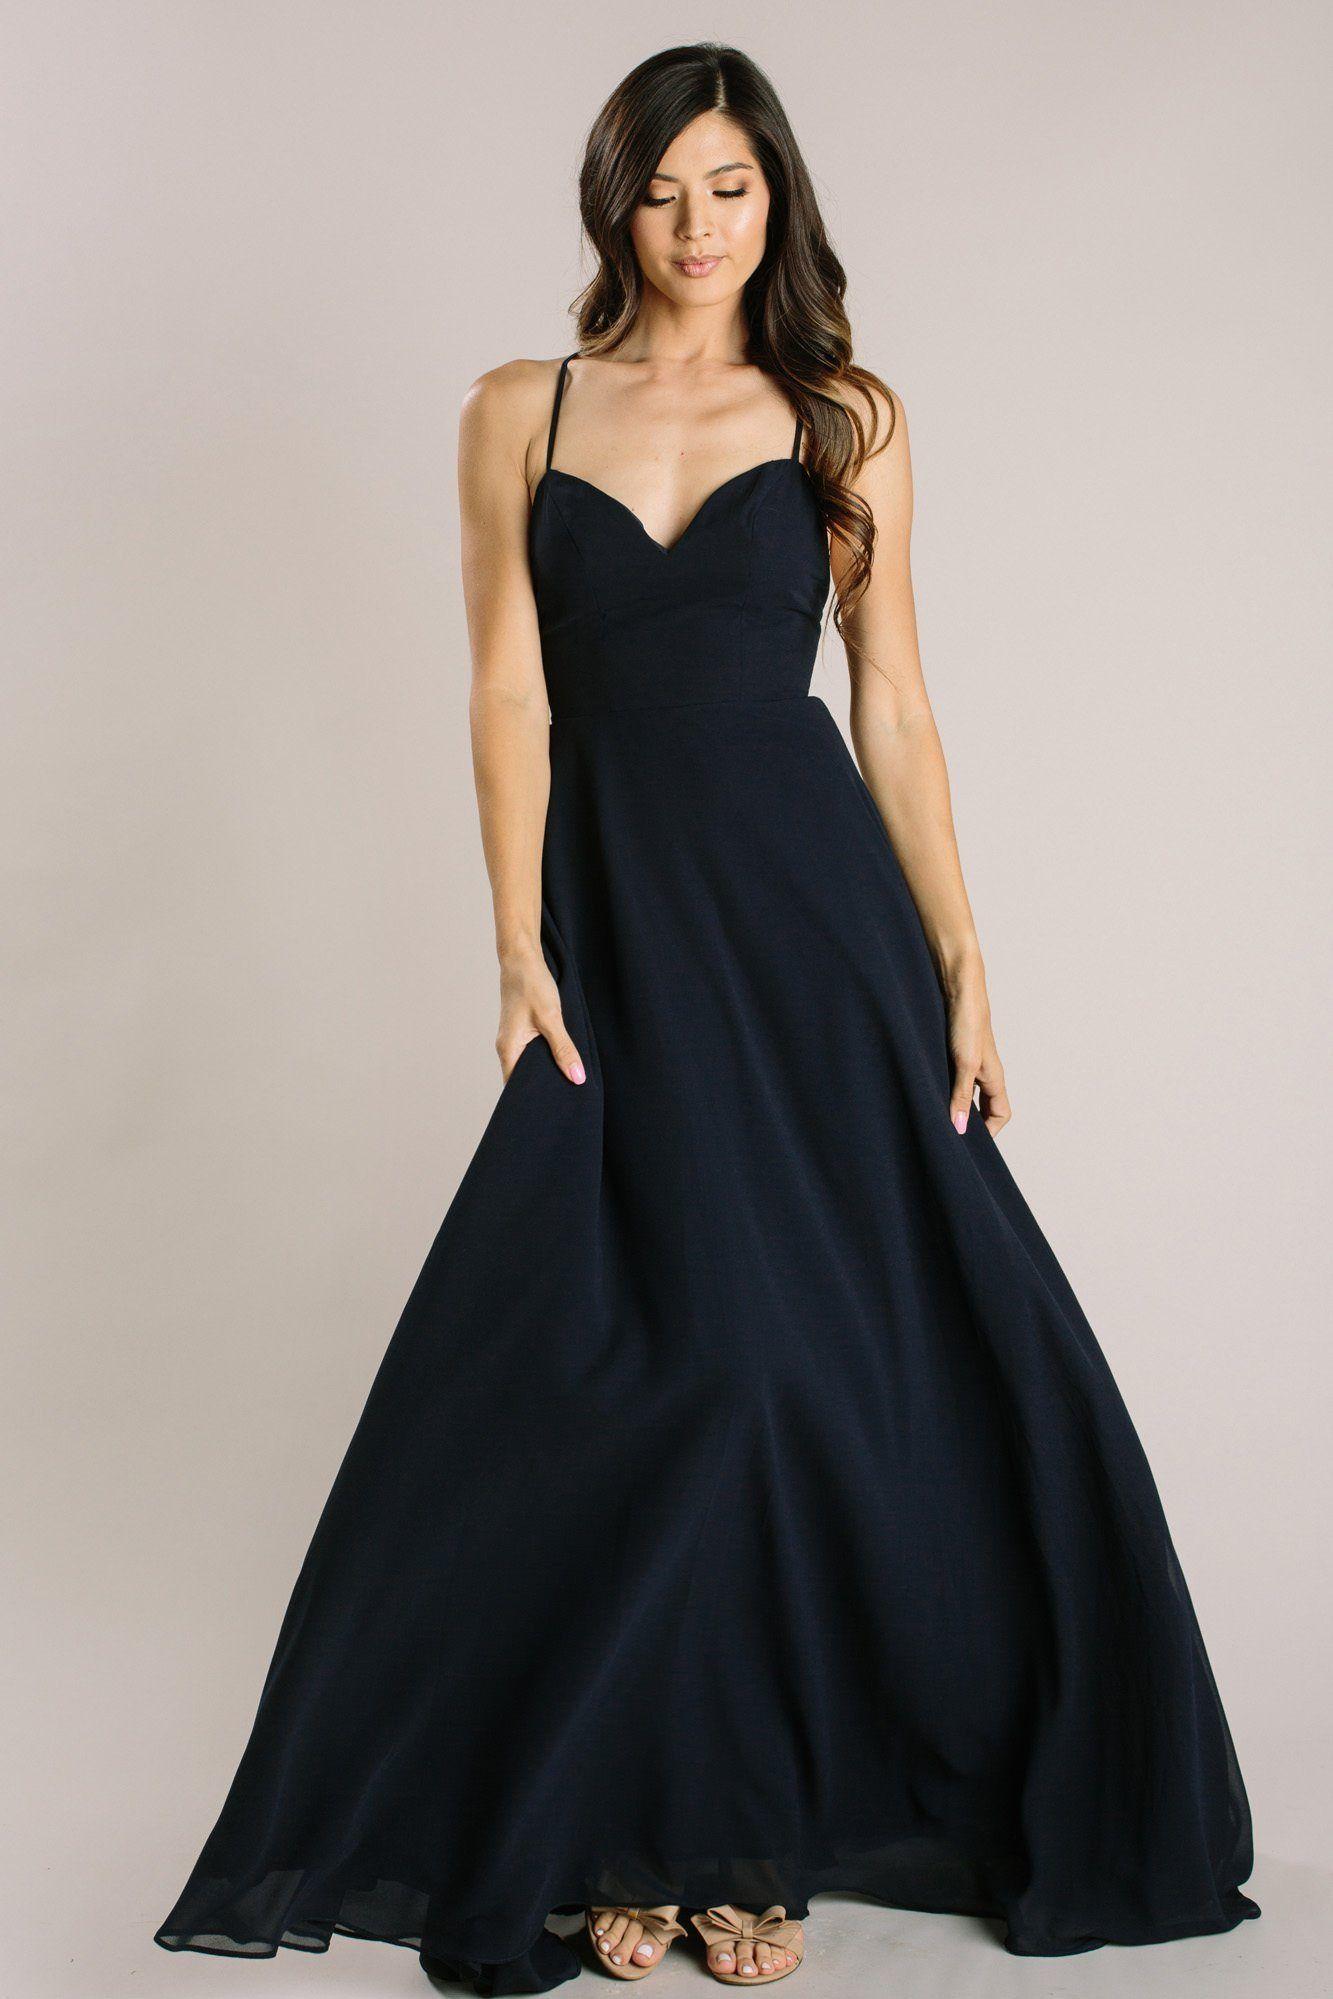 Mia Sweetheart Maxi Dress Navy X Large In 2021 Dresses Maxi Dress Boutique Maxi Dresses [ 1999 x 1333 Pixel ]